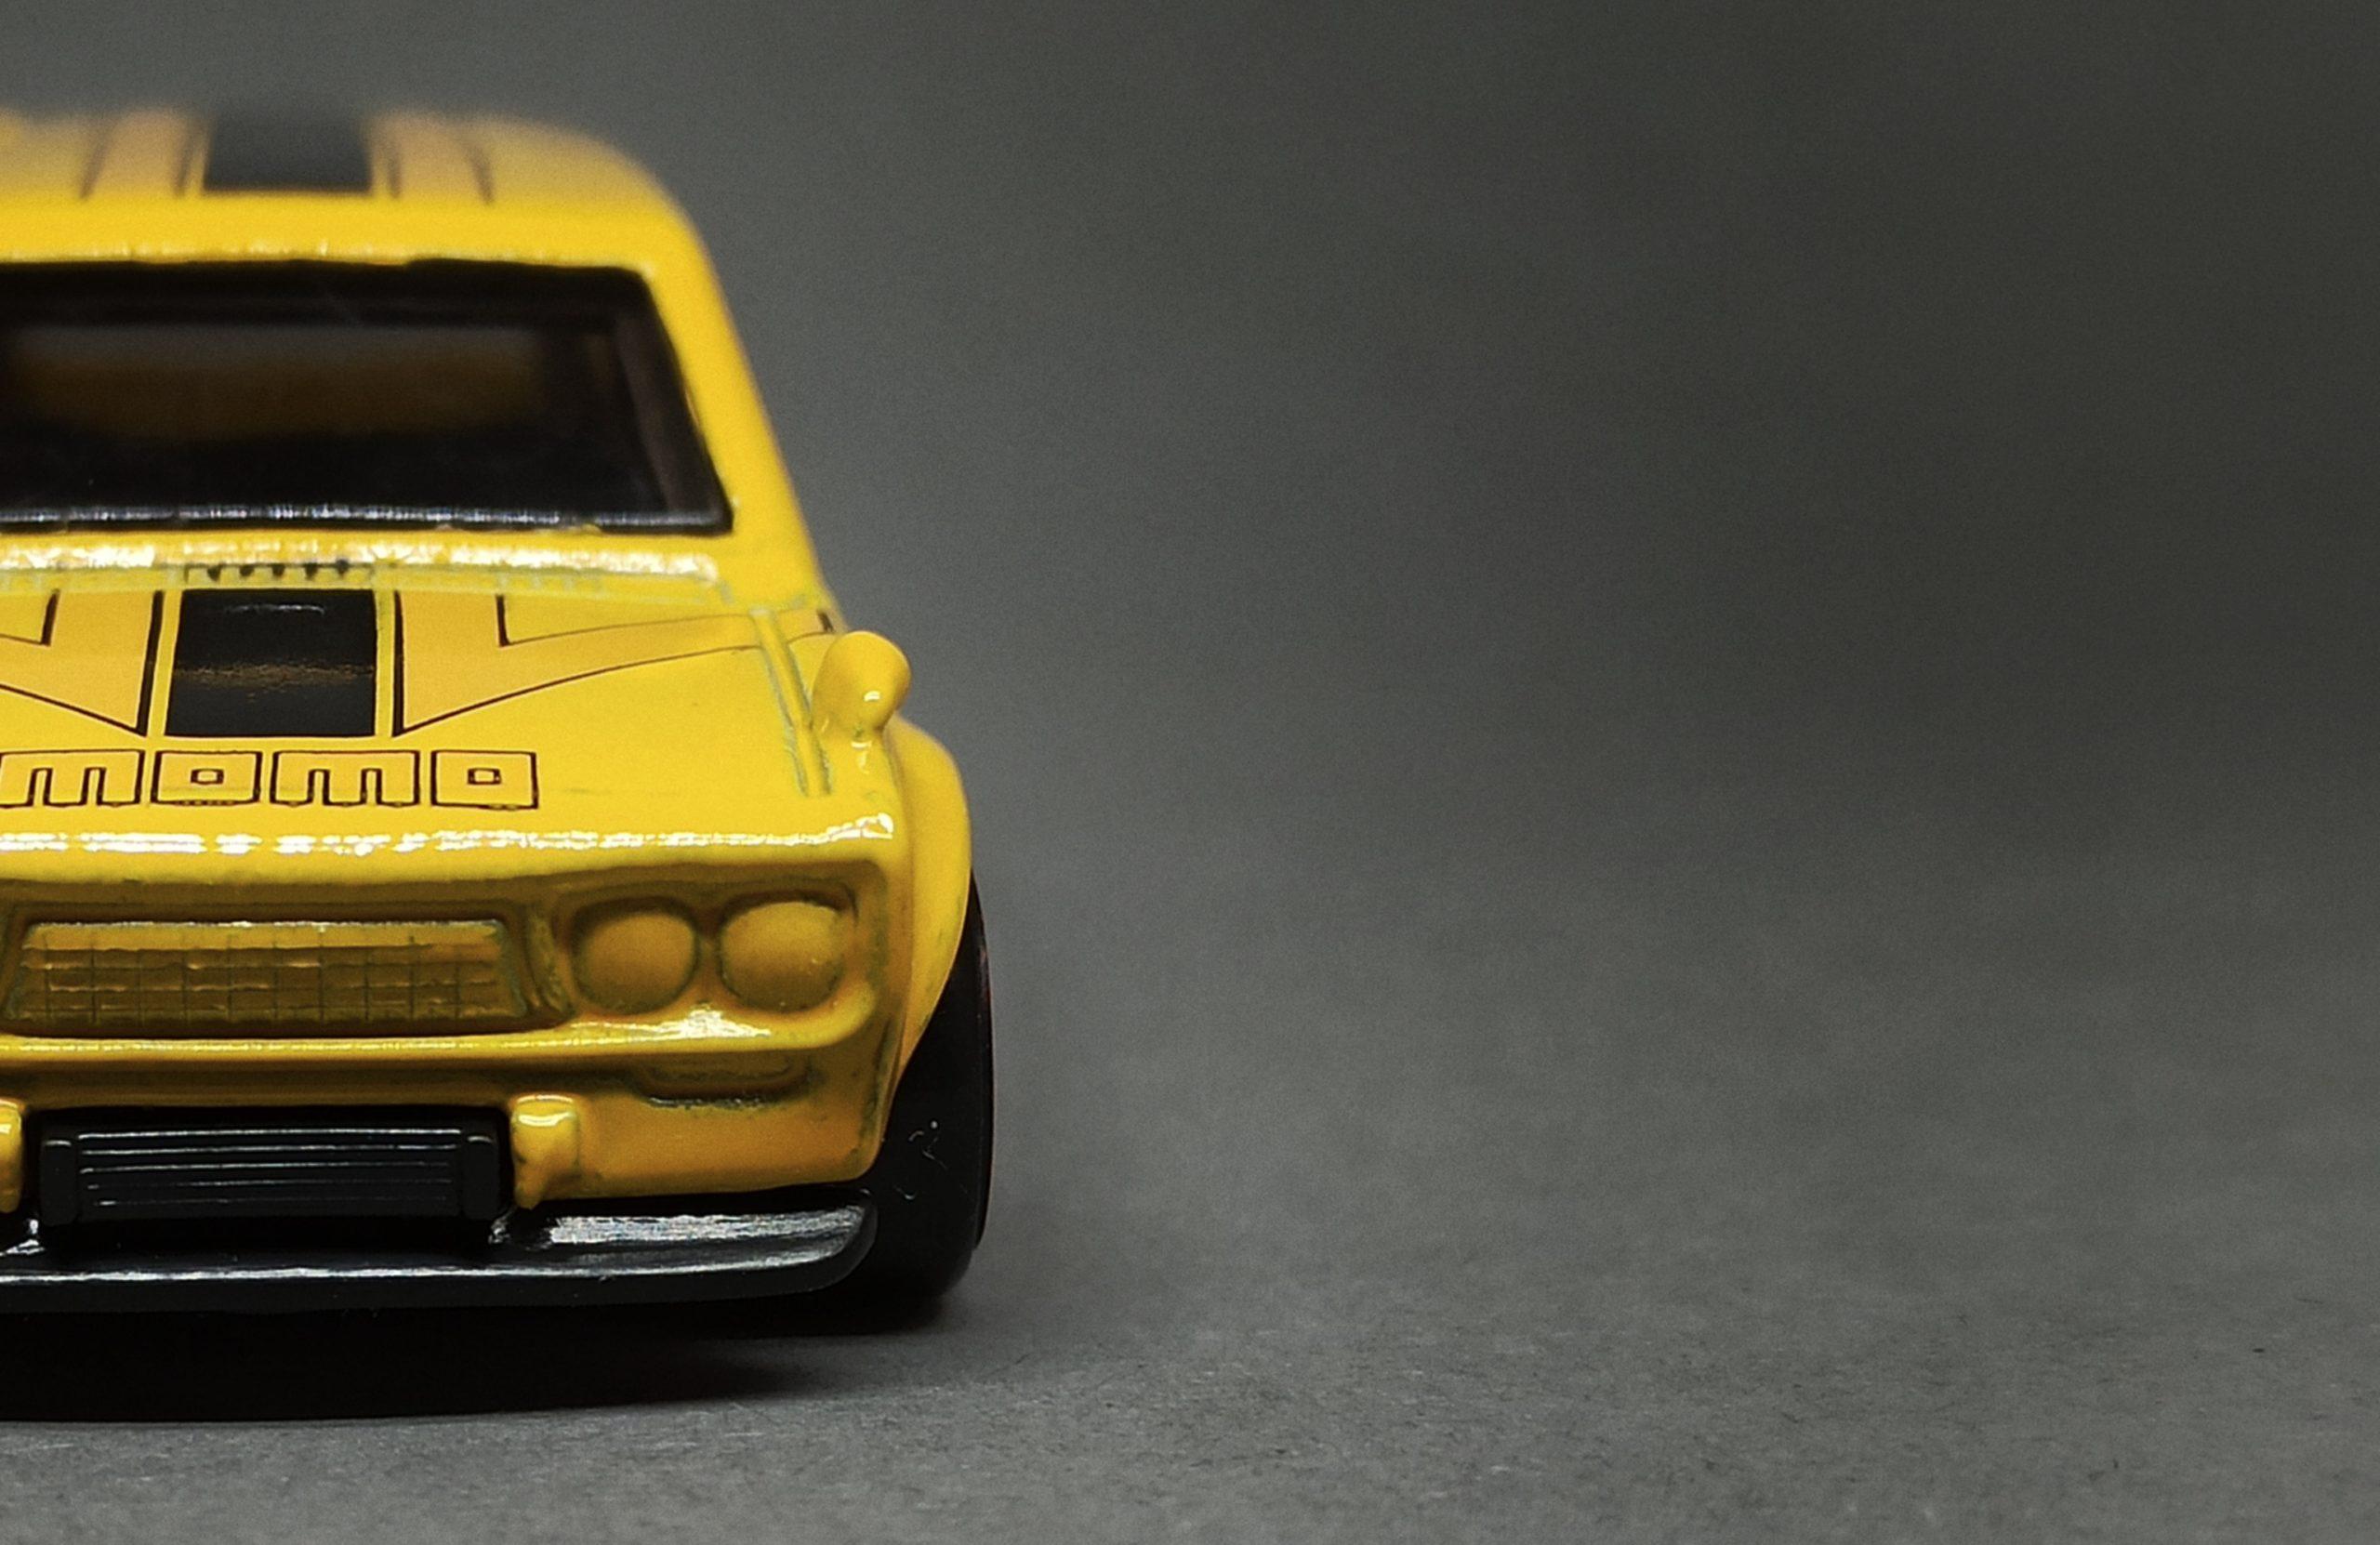 Hot Wheels '71 Datsun Bluebird 510 Wagon (GHG57) 2020 (146/250) HW Speed Graphics (8/10) yellow (Kroger Exclusive) front